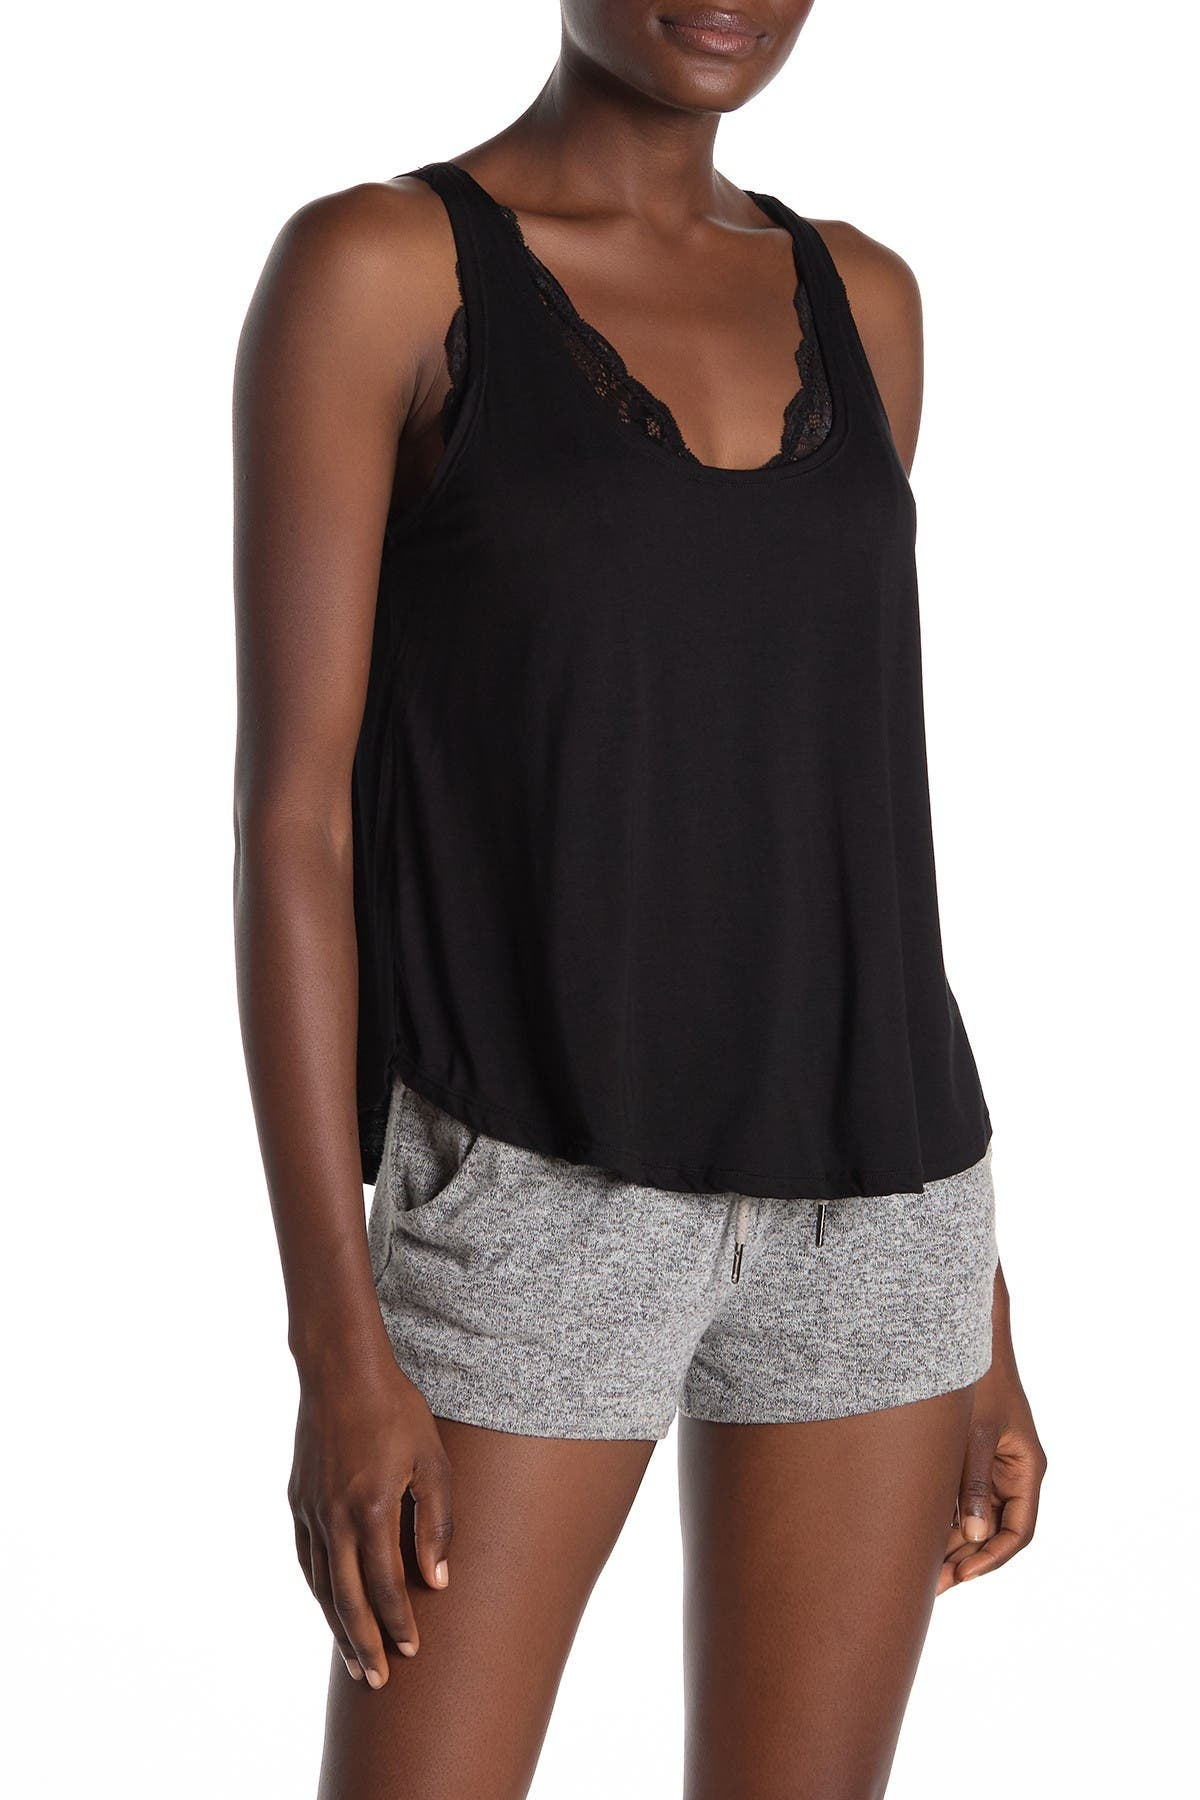 Image of Honeydew Intimates Aubrey Pajama Top